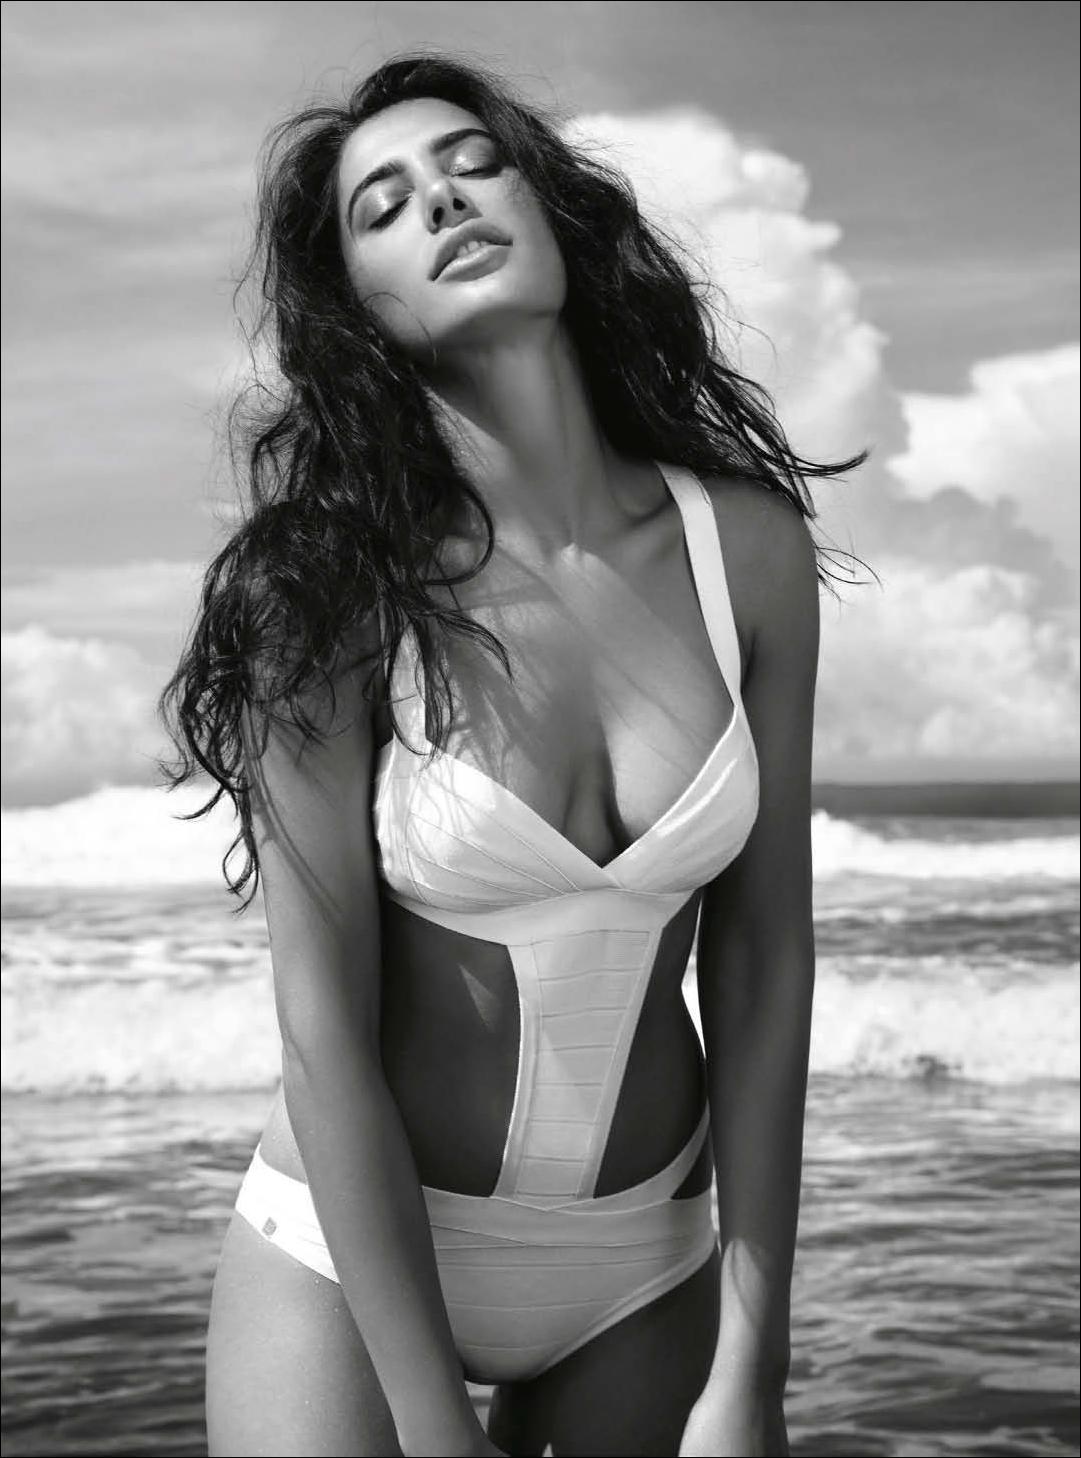 Nargis Fakhri world most beautiful girl